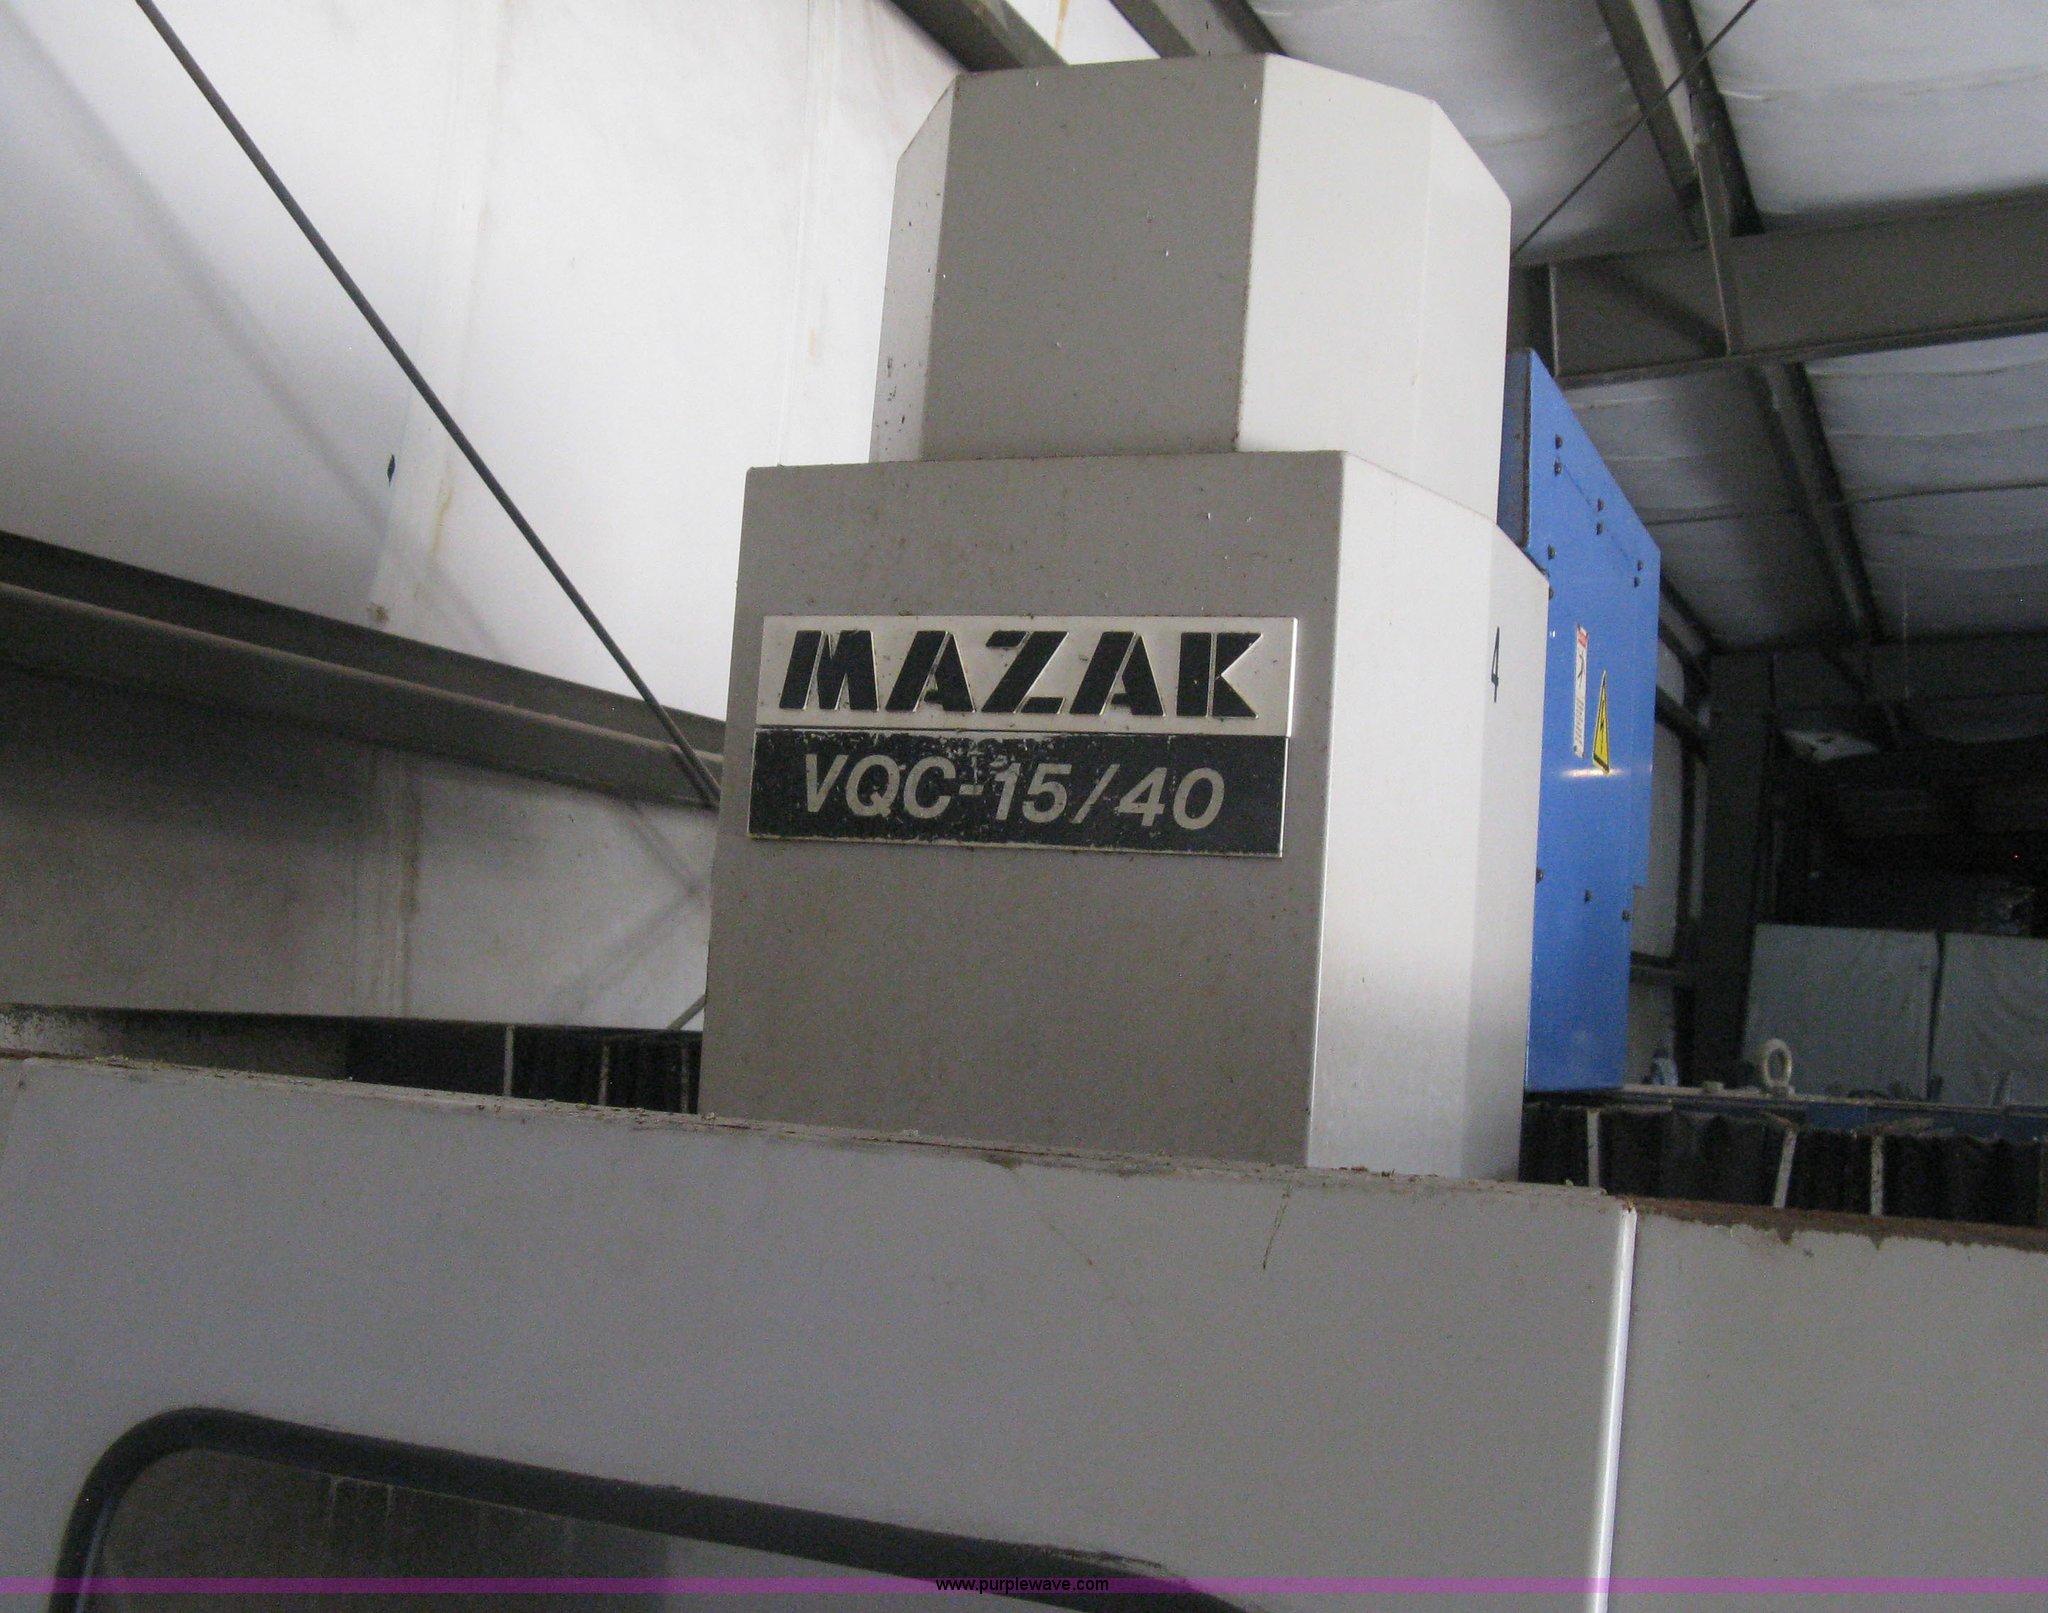 Mazak VQC-15/40 CNC mill   Item H5360   SOLD! July 23 Vehicl